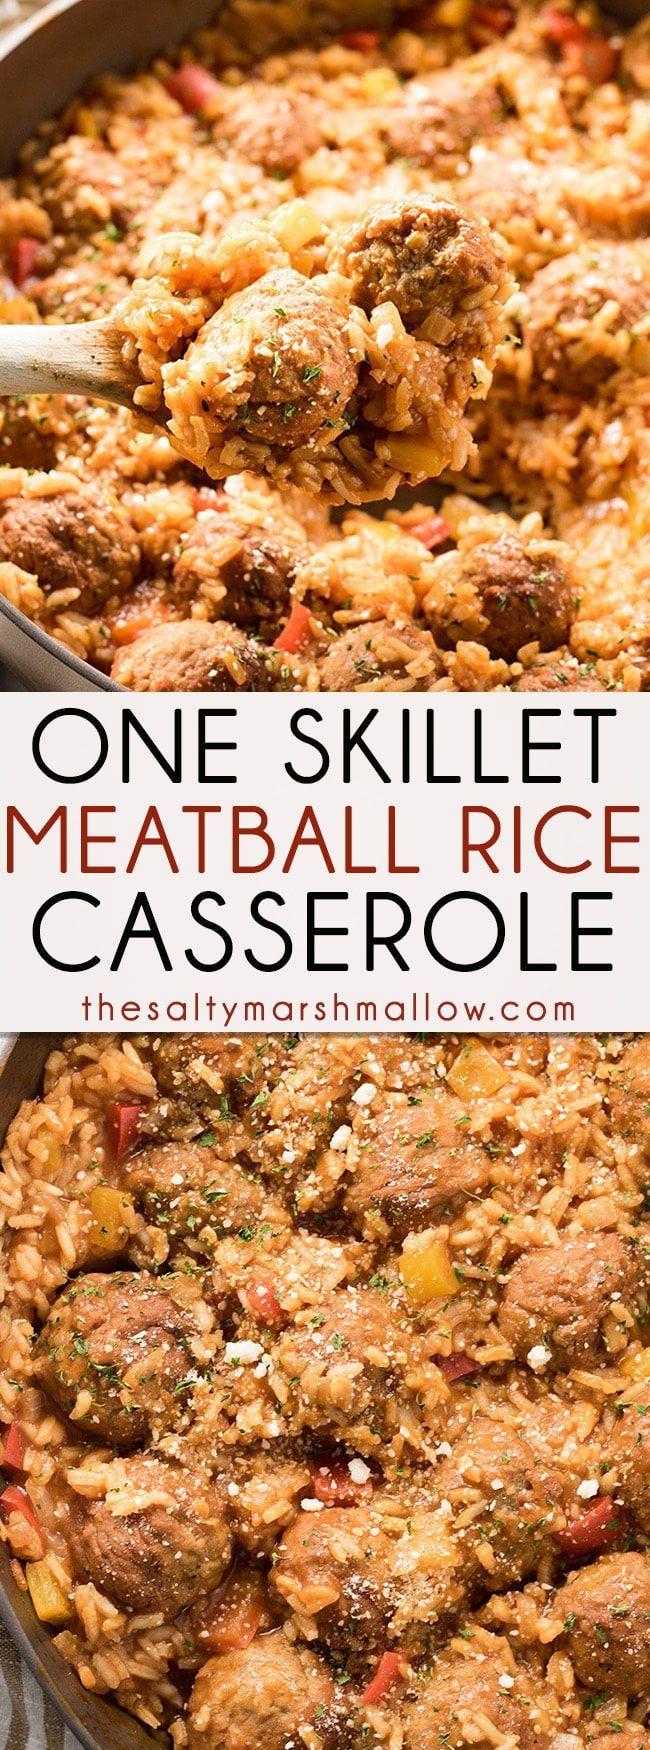 One Skillet Italian Meatballs and Rice Casserole